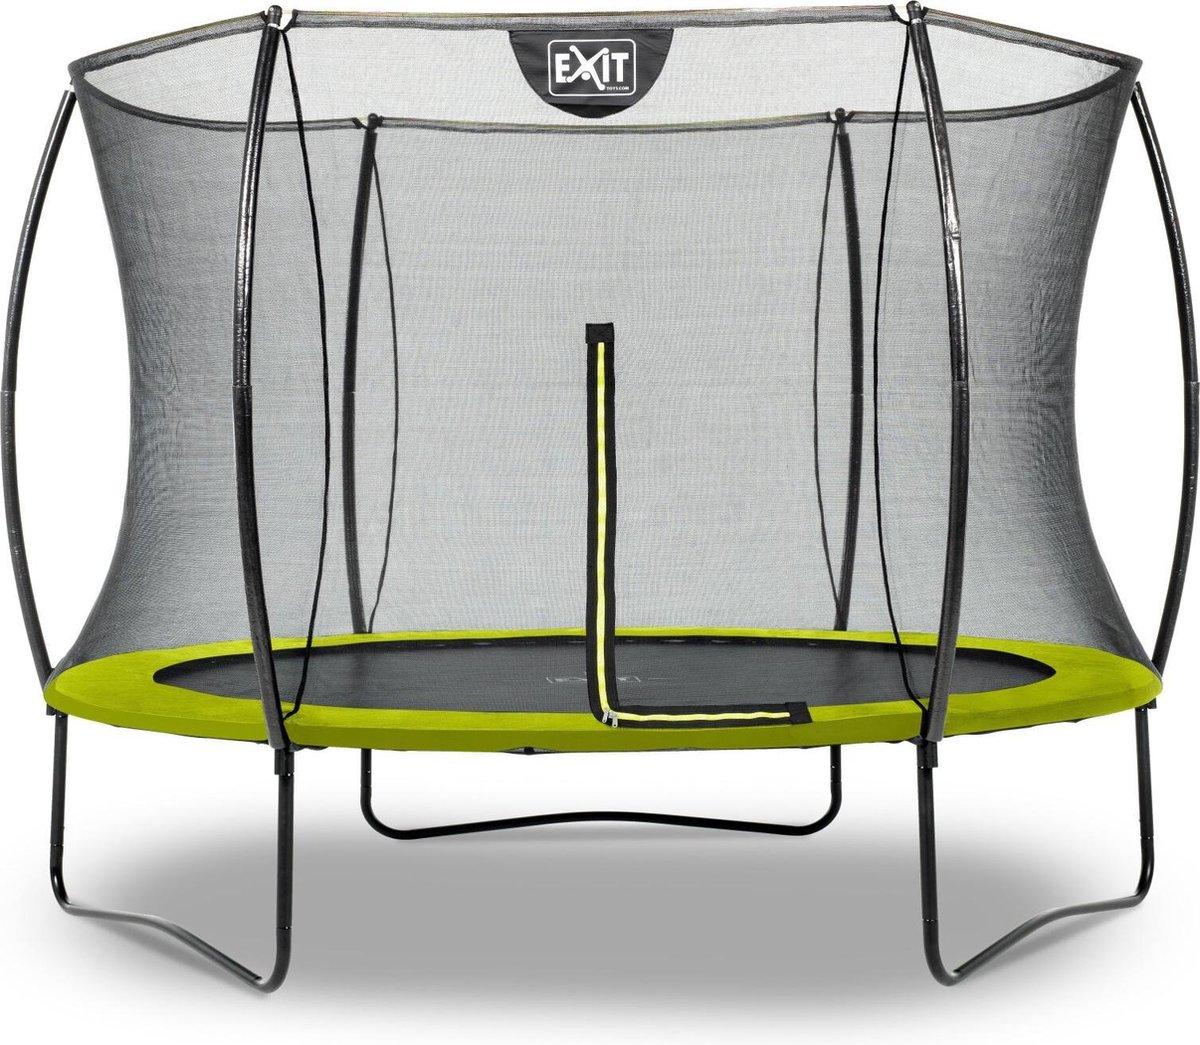 Trampoline EXIT Silhouette - ø244cm - groen